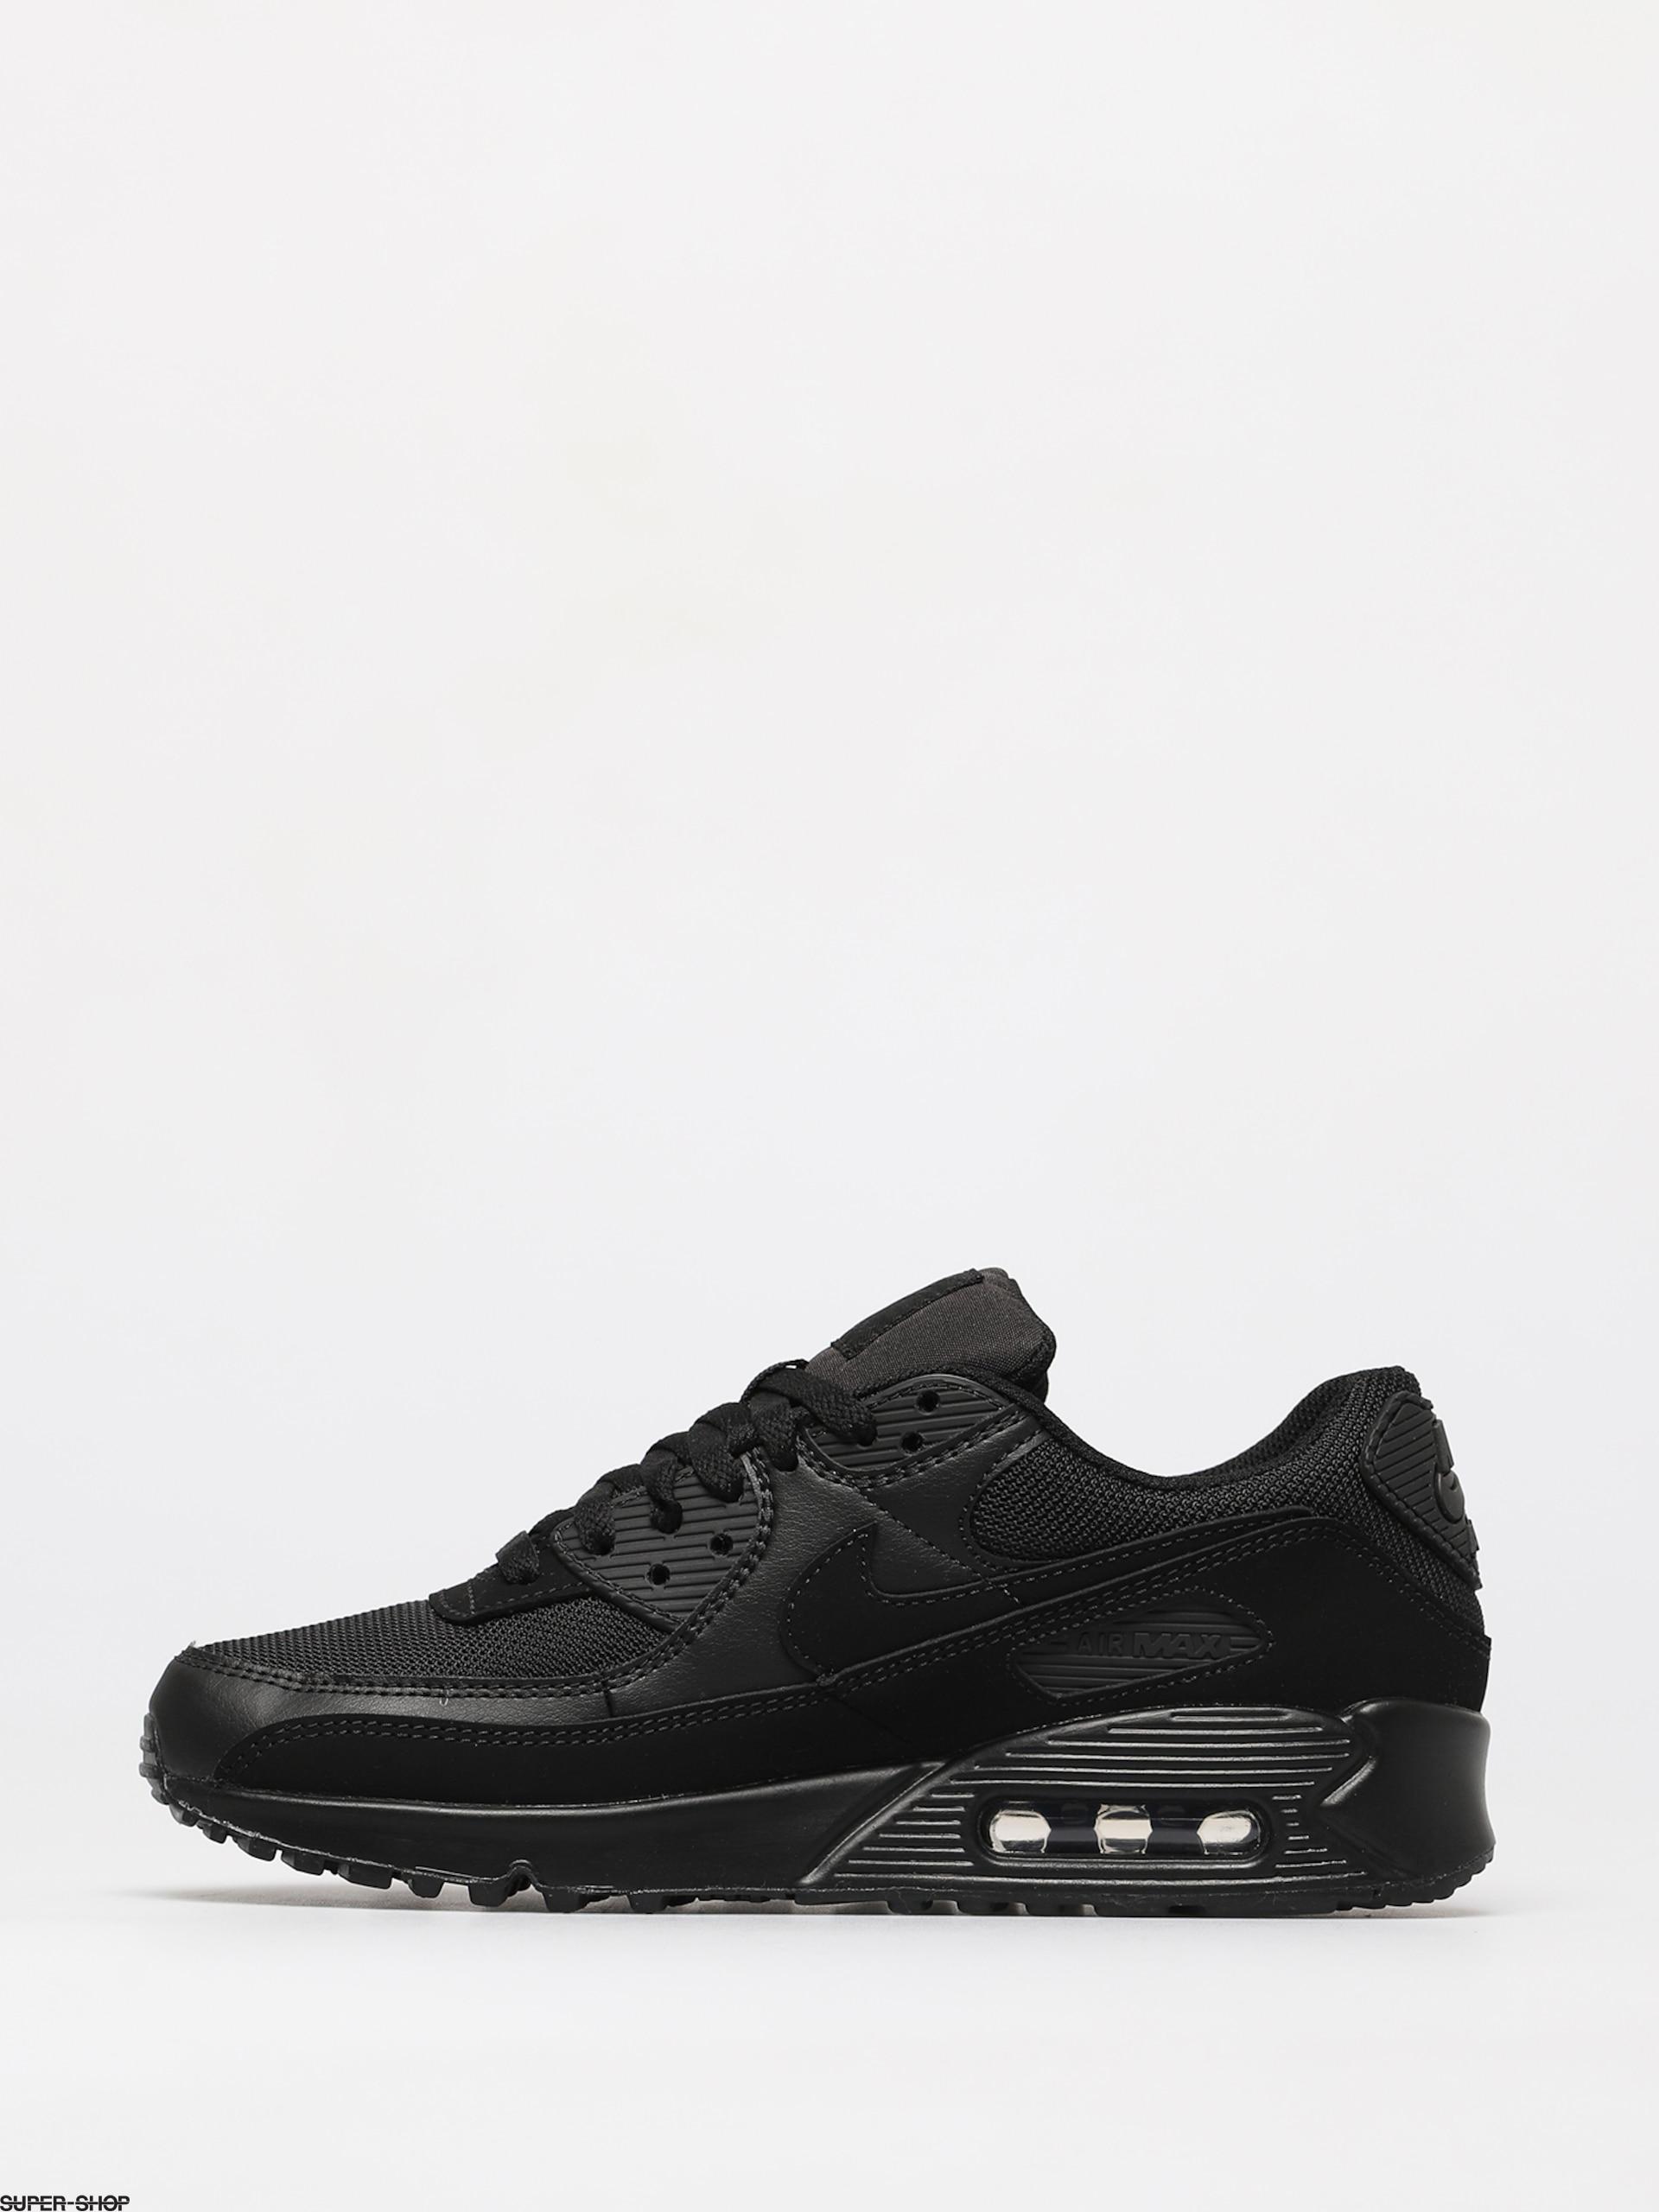 Nike Air Max 90 Sneakers in All Black